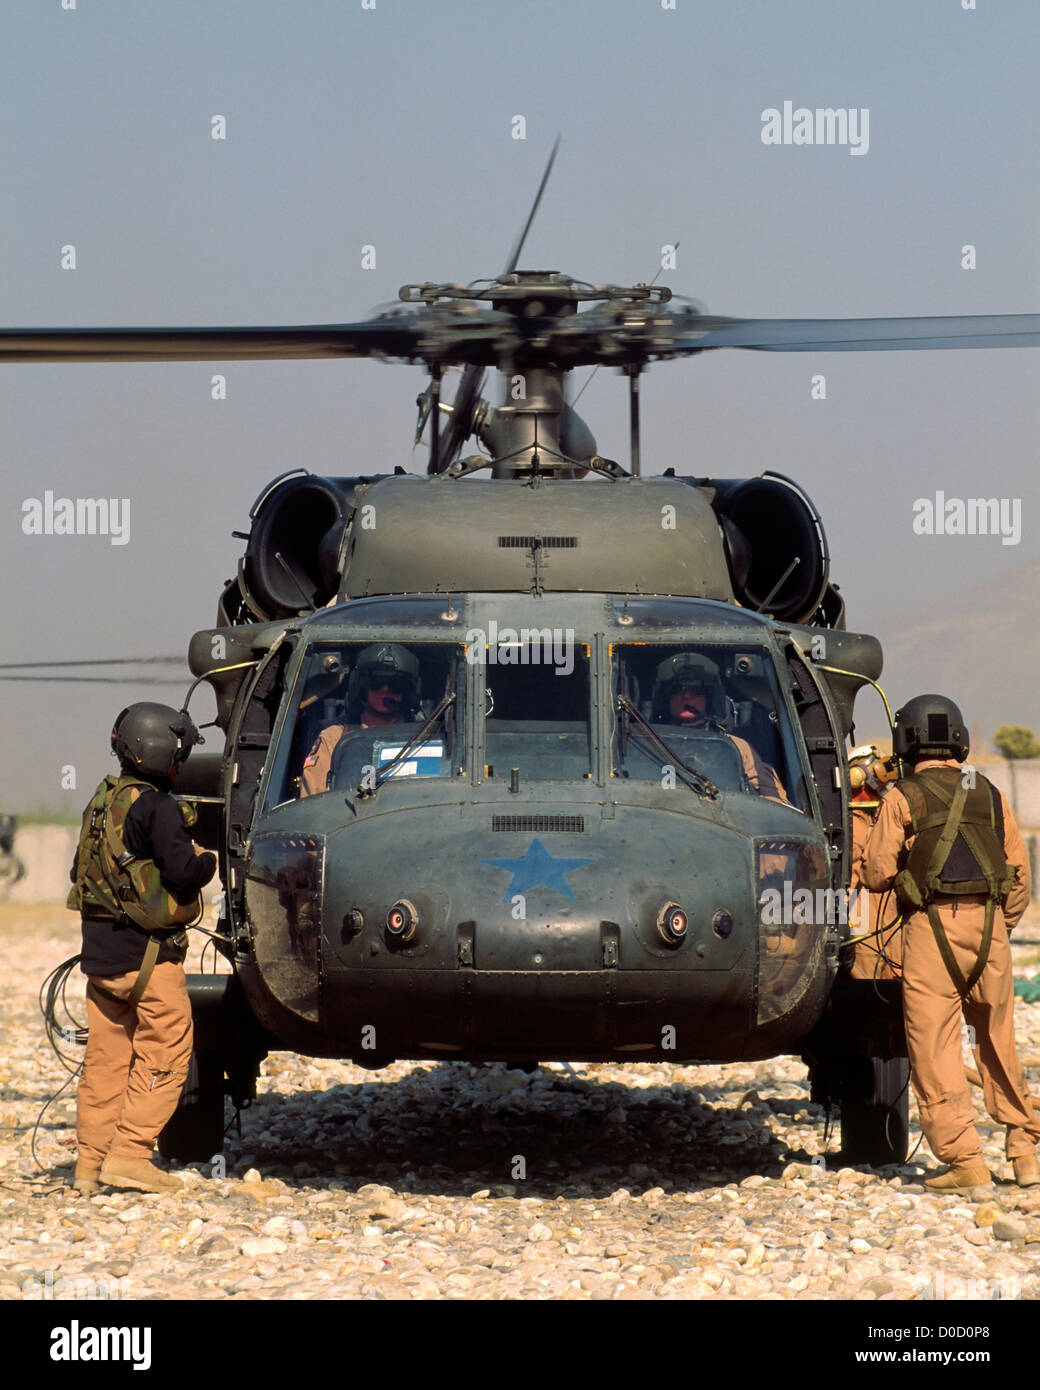 UH-60 Blackhawk at Jalalabad, Afghanistan - Stock Image